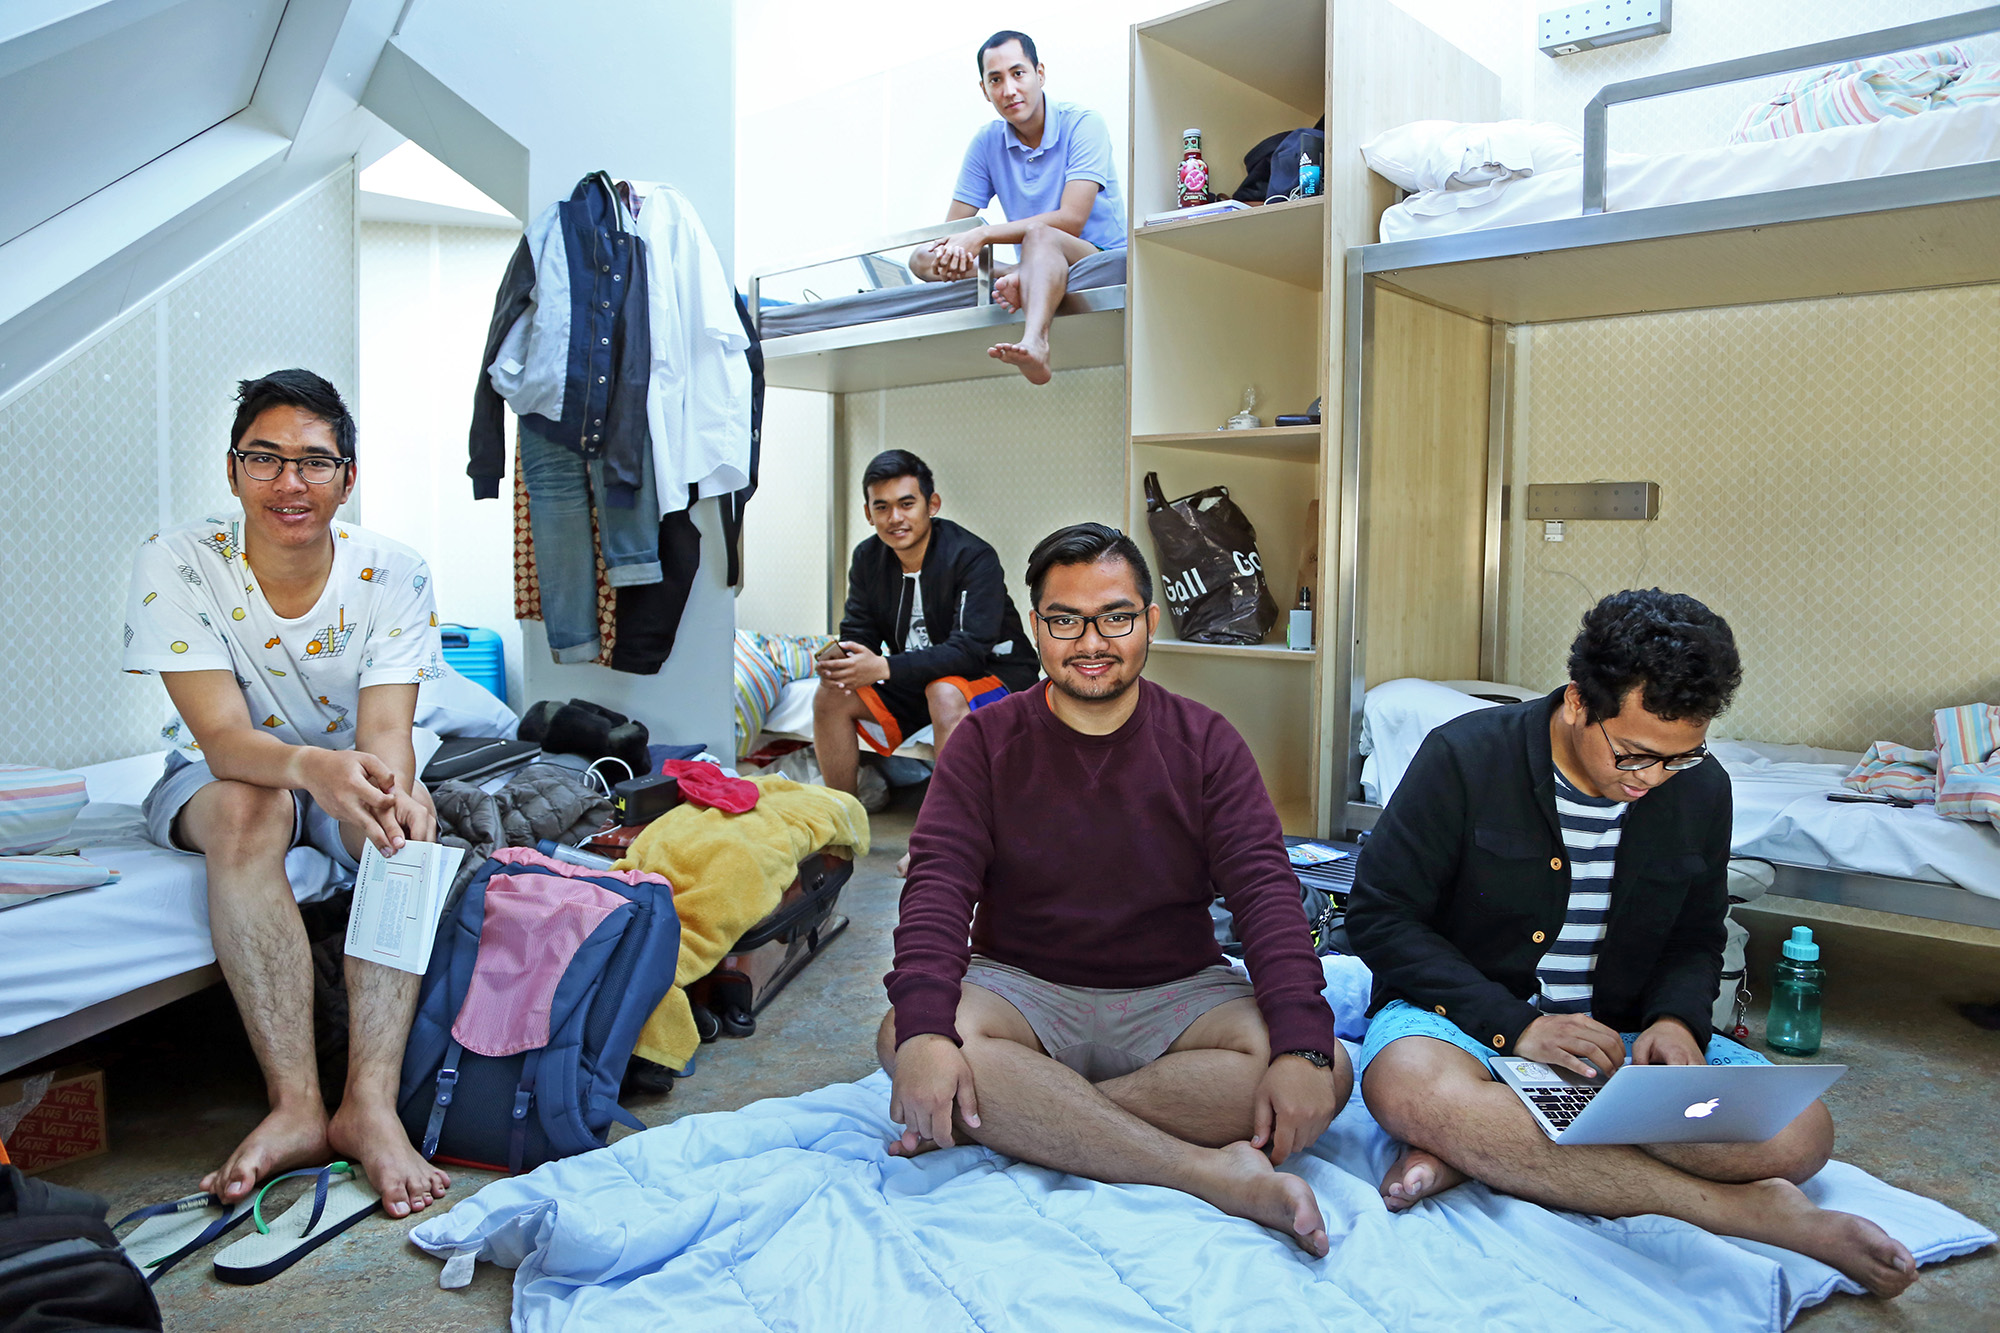 reportage-huisvesting-internationals-6